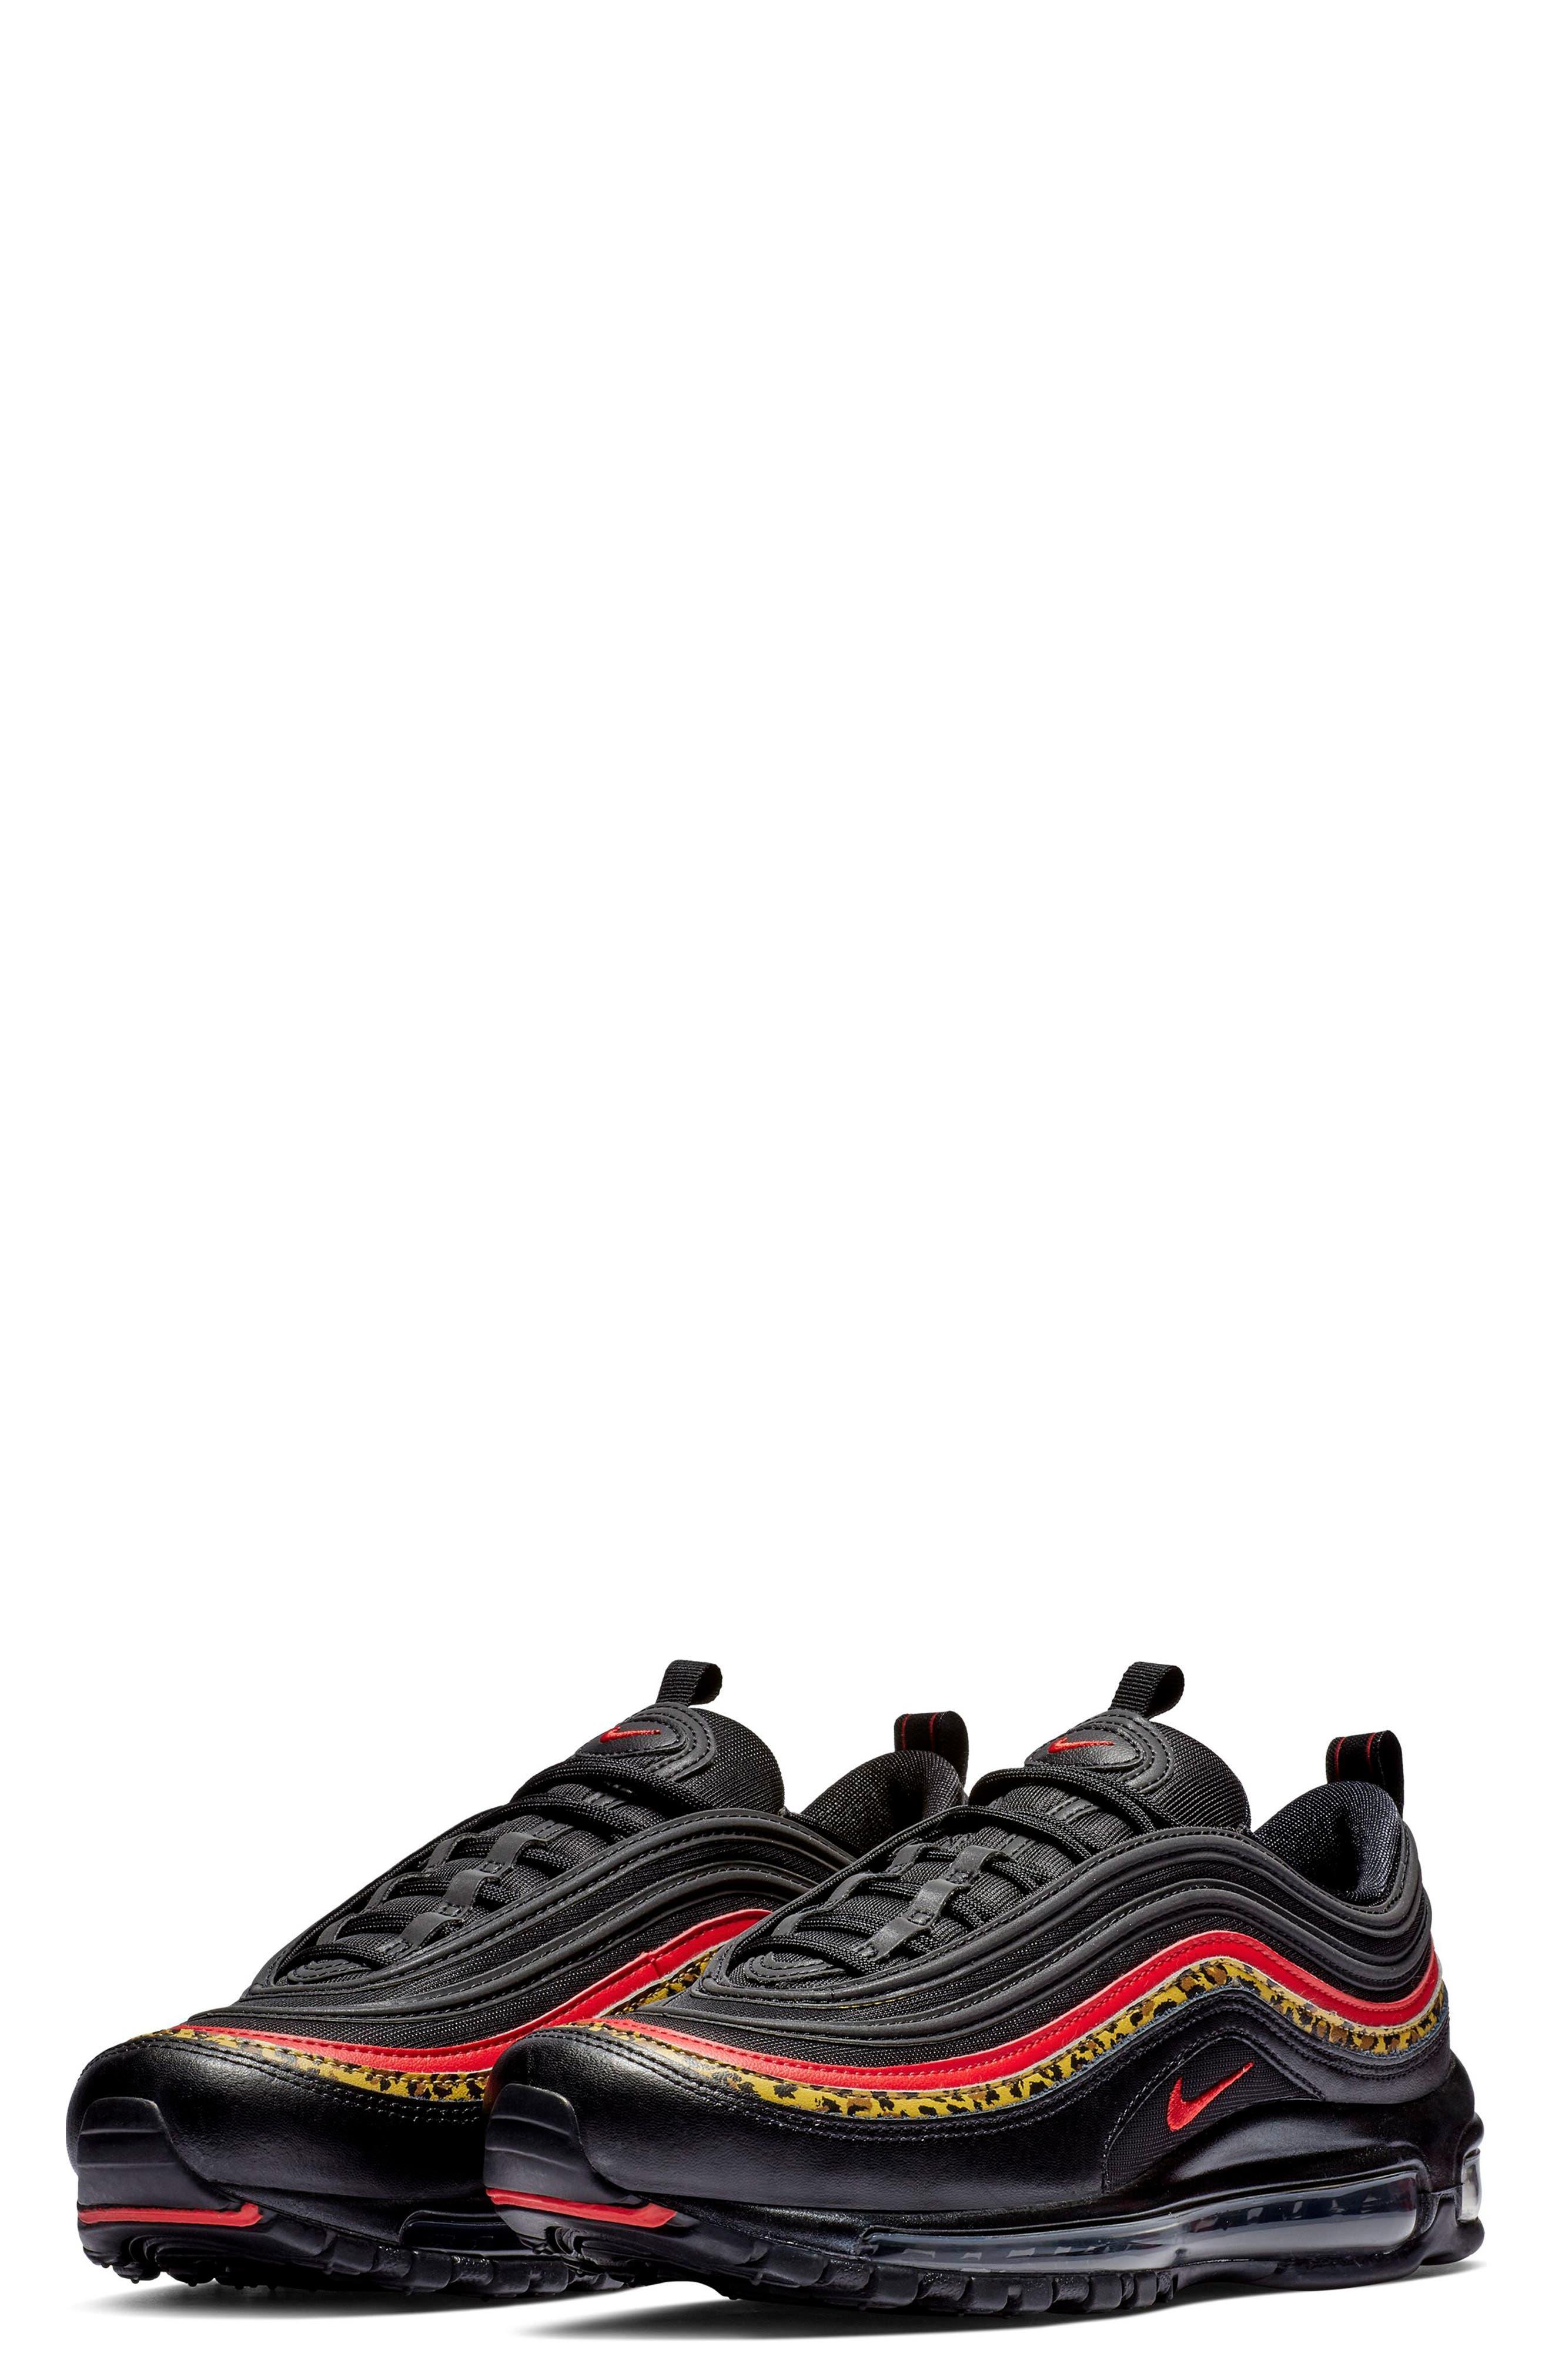 NIKE, Air Max 97 Sneaker, Main thumbnail 1, color, 001